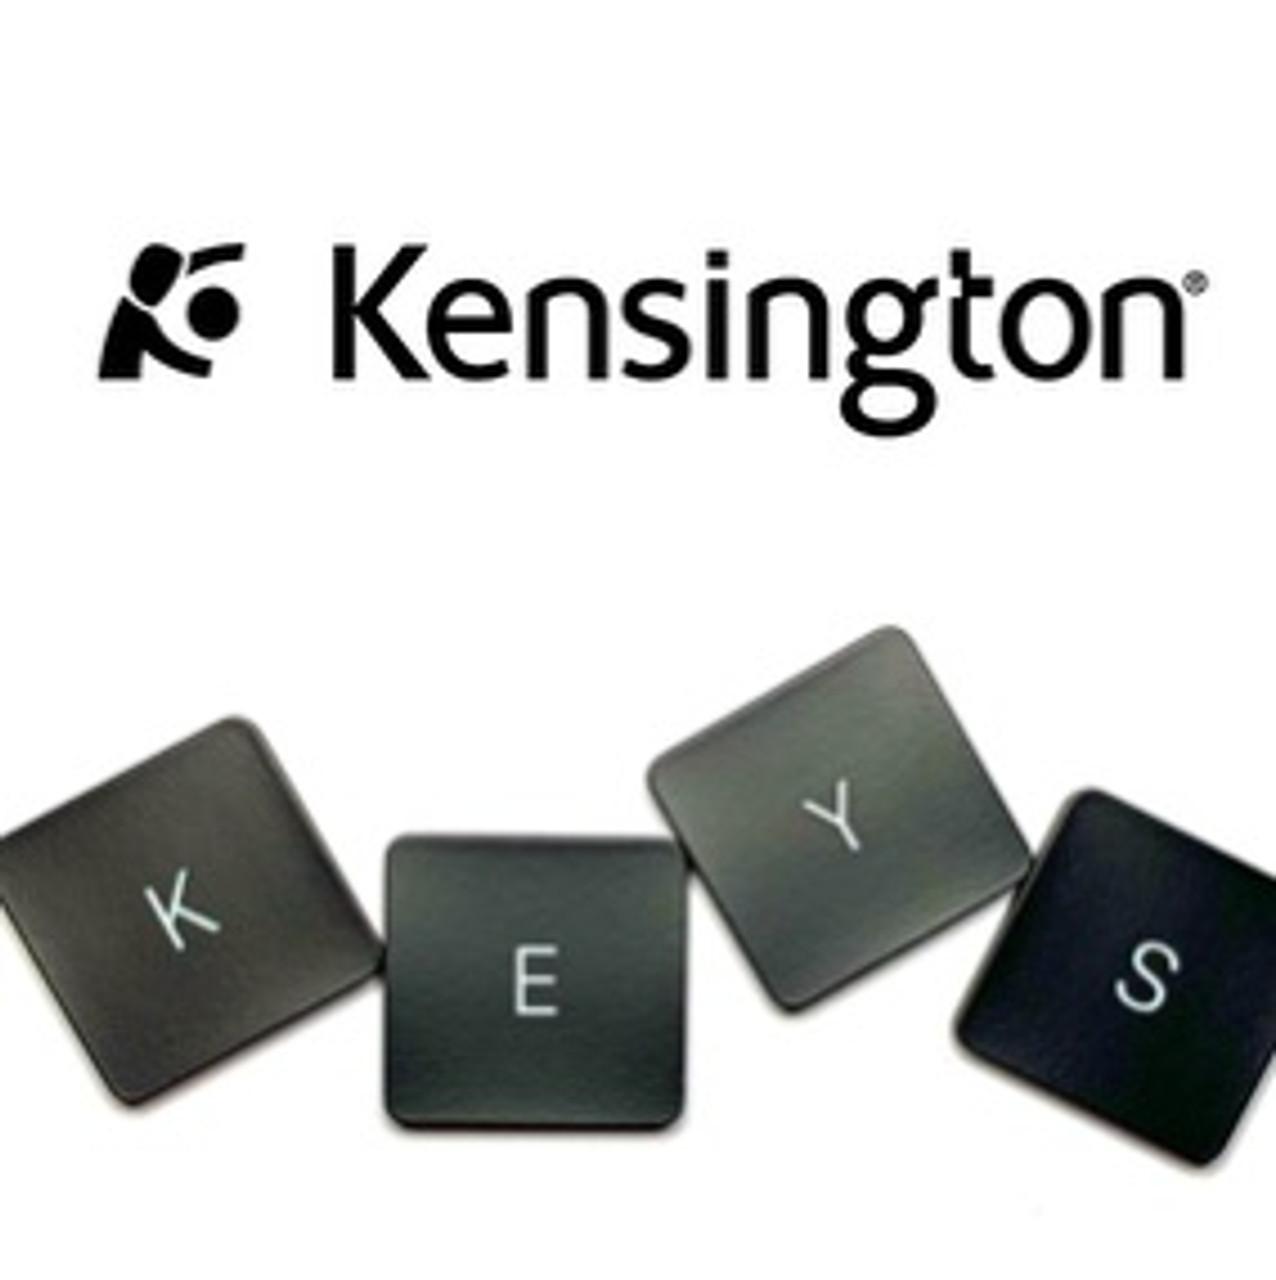 Kensington Keyfolio Pro Folio Keyboard Key Replacement For